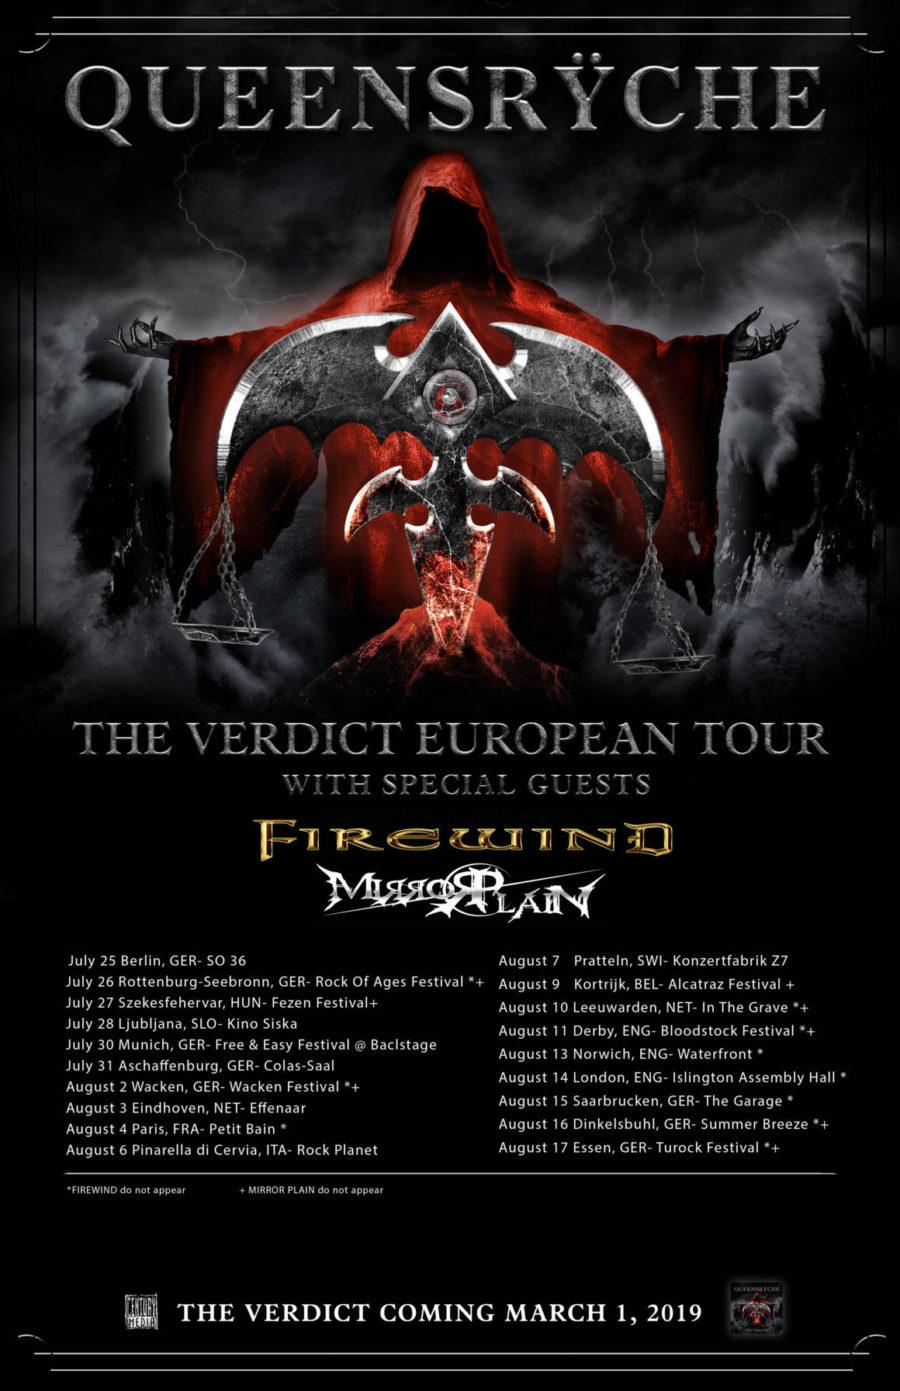 Queensryche - The Verdict Tour